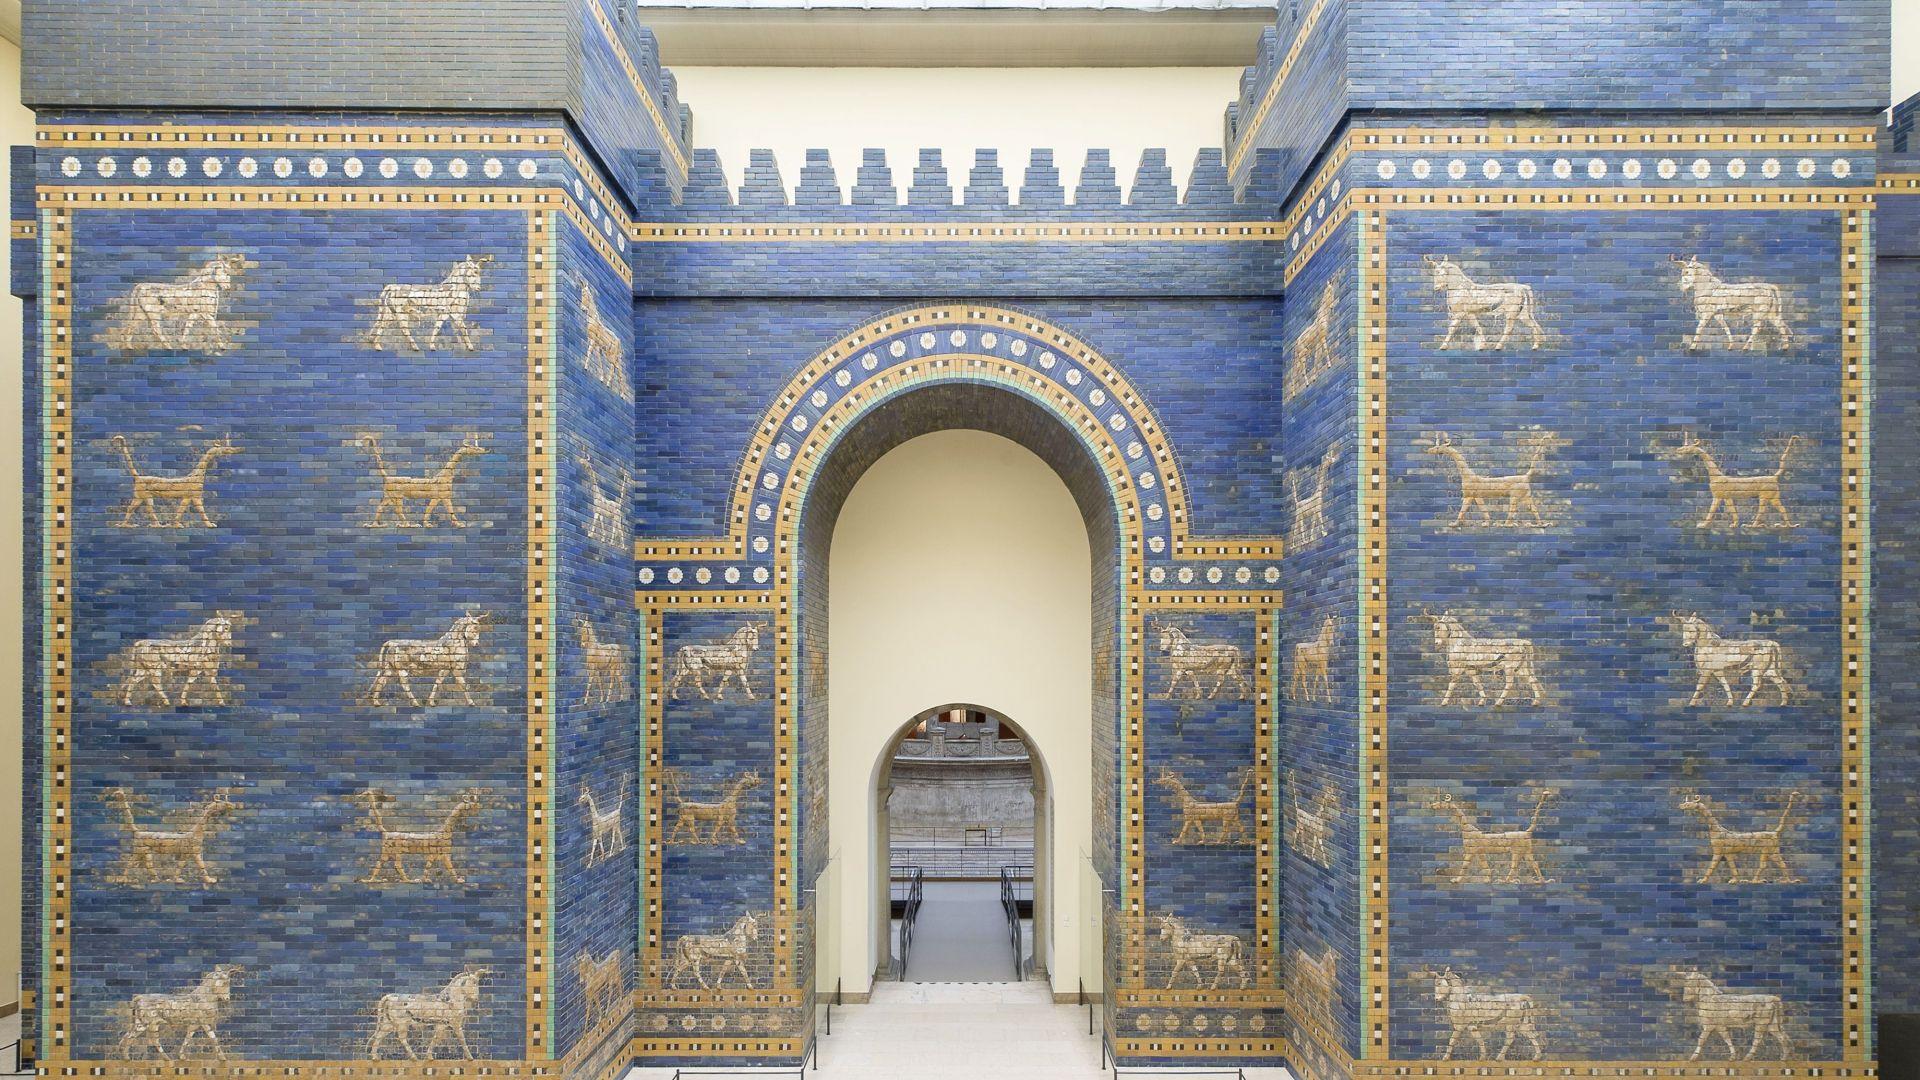 Berlin: Ishtar Gate in the Pergamon Museum